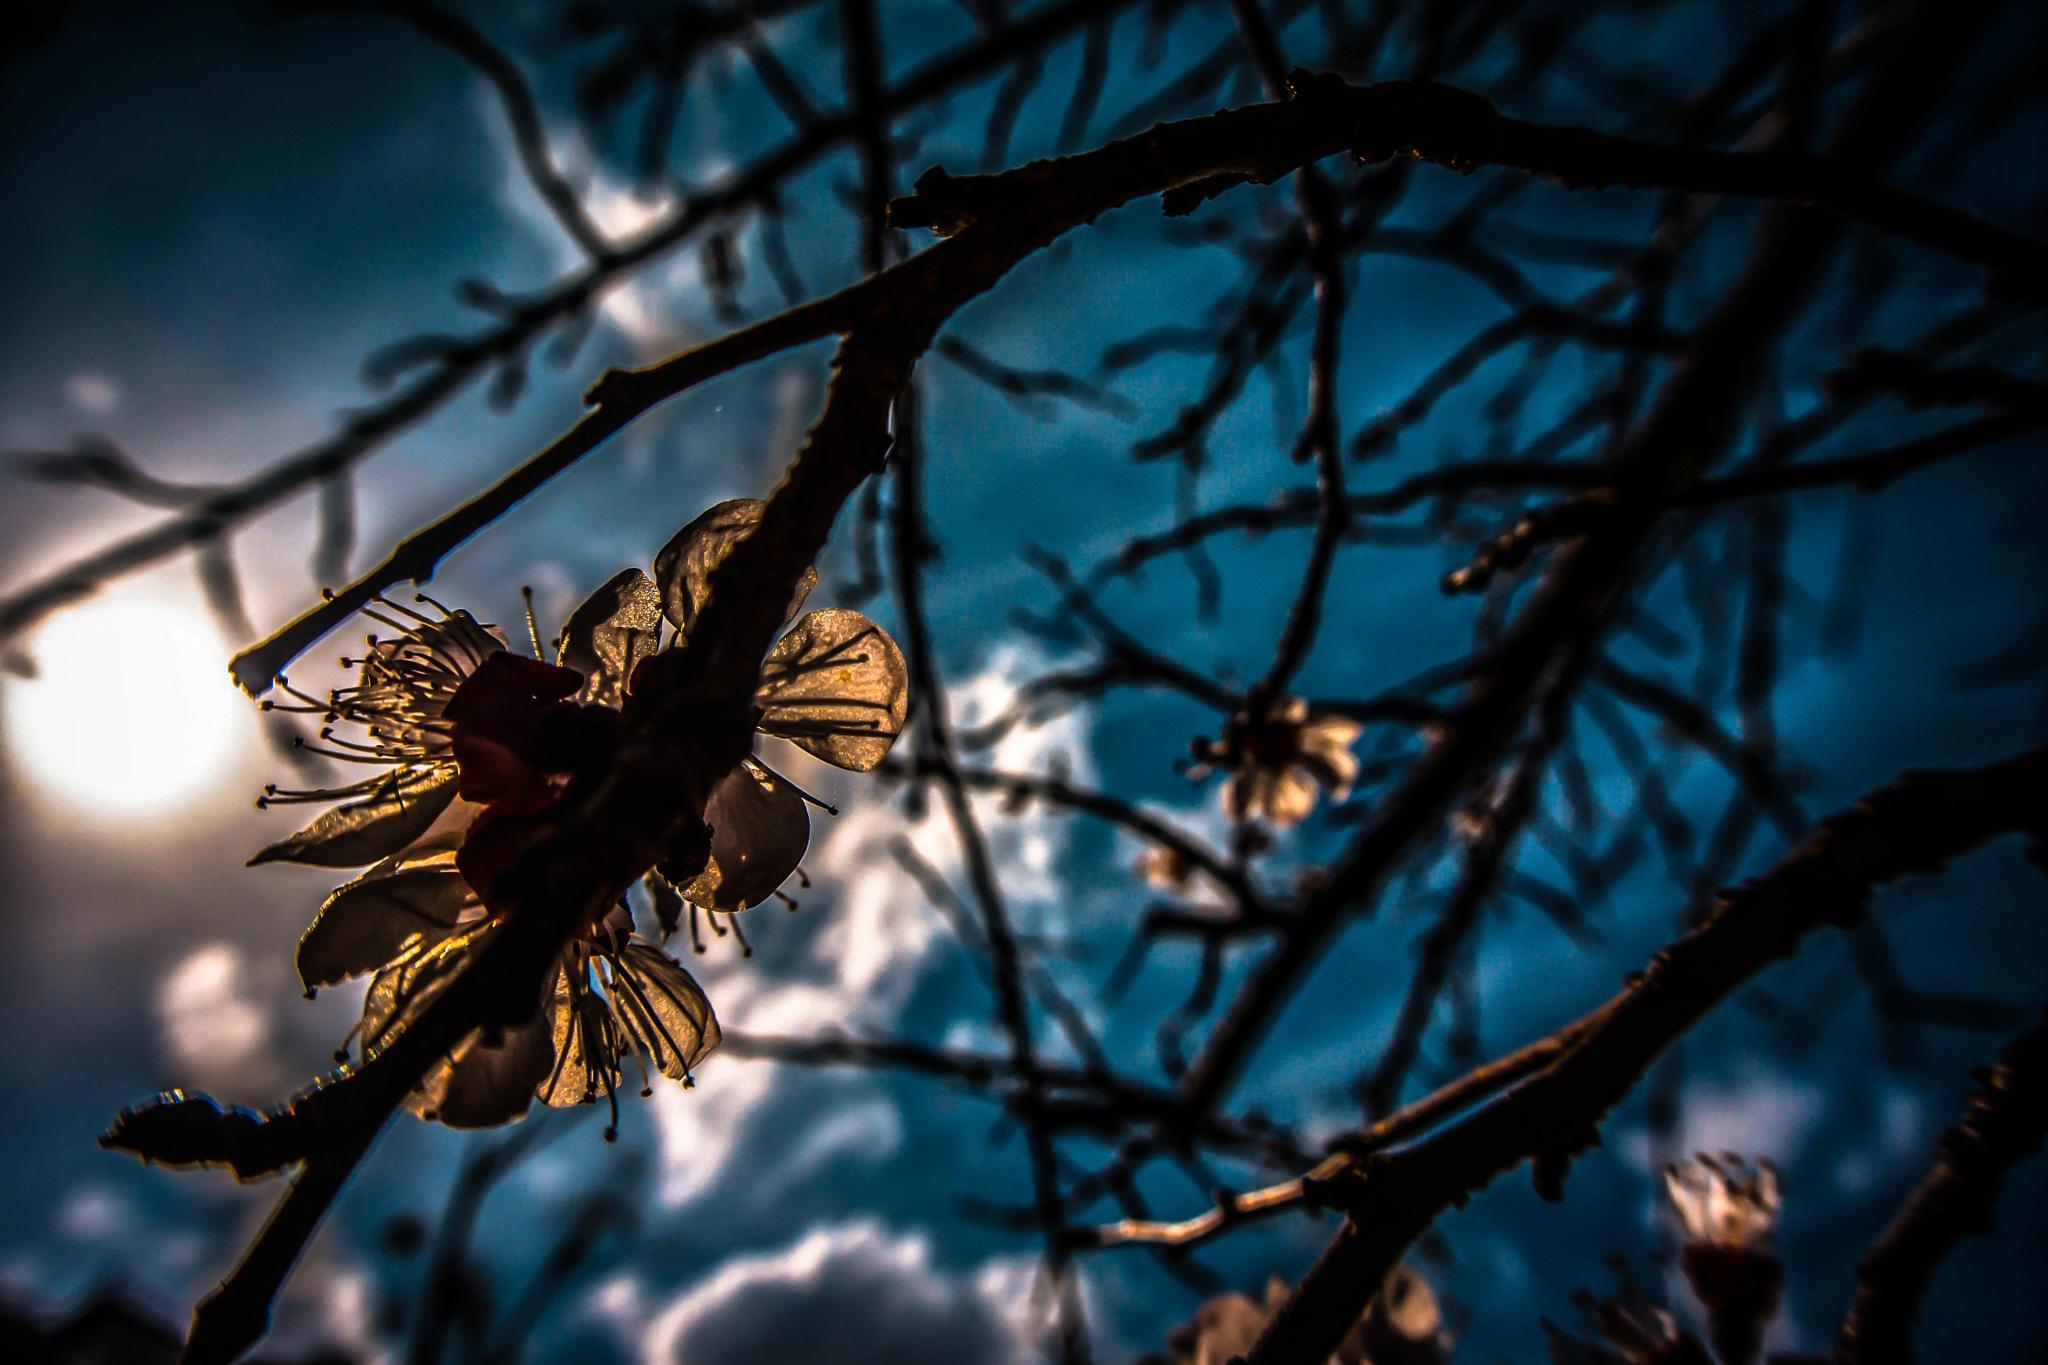 Under the blue sky by Elias Papageorgiou (Drifter Dfr)